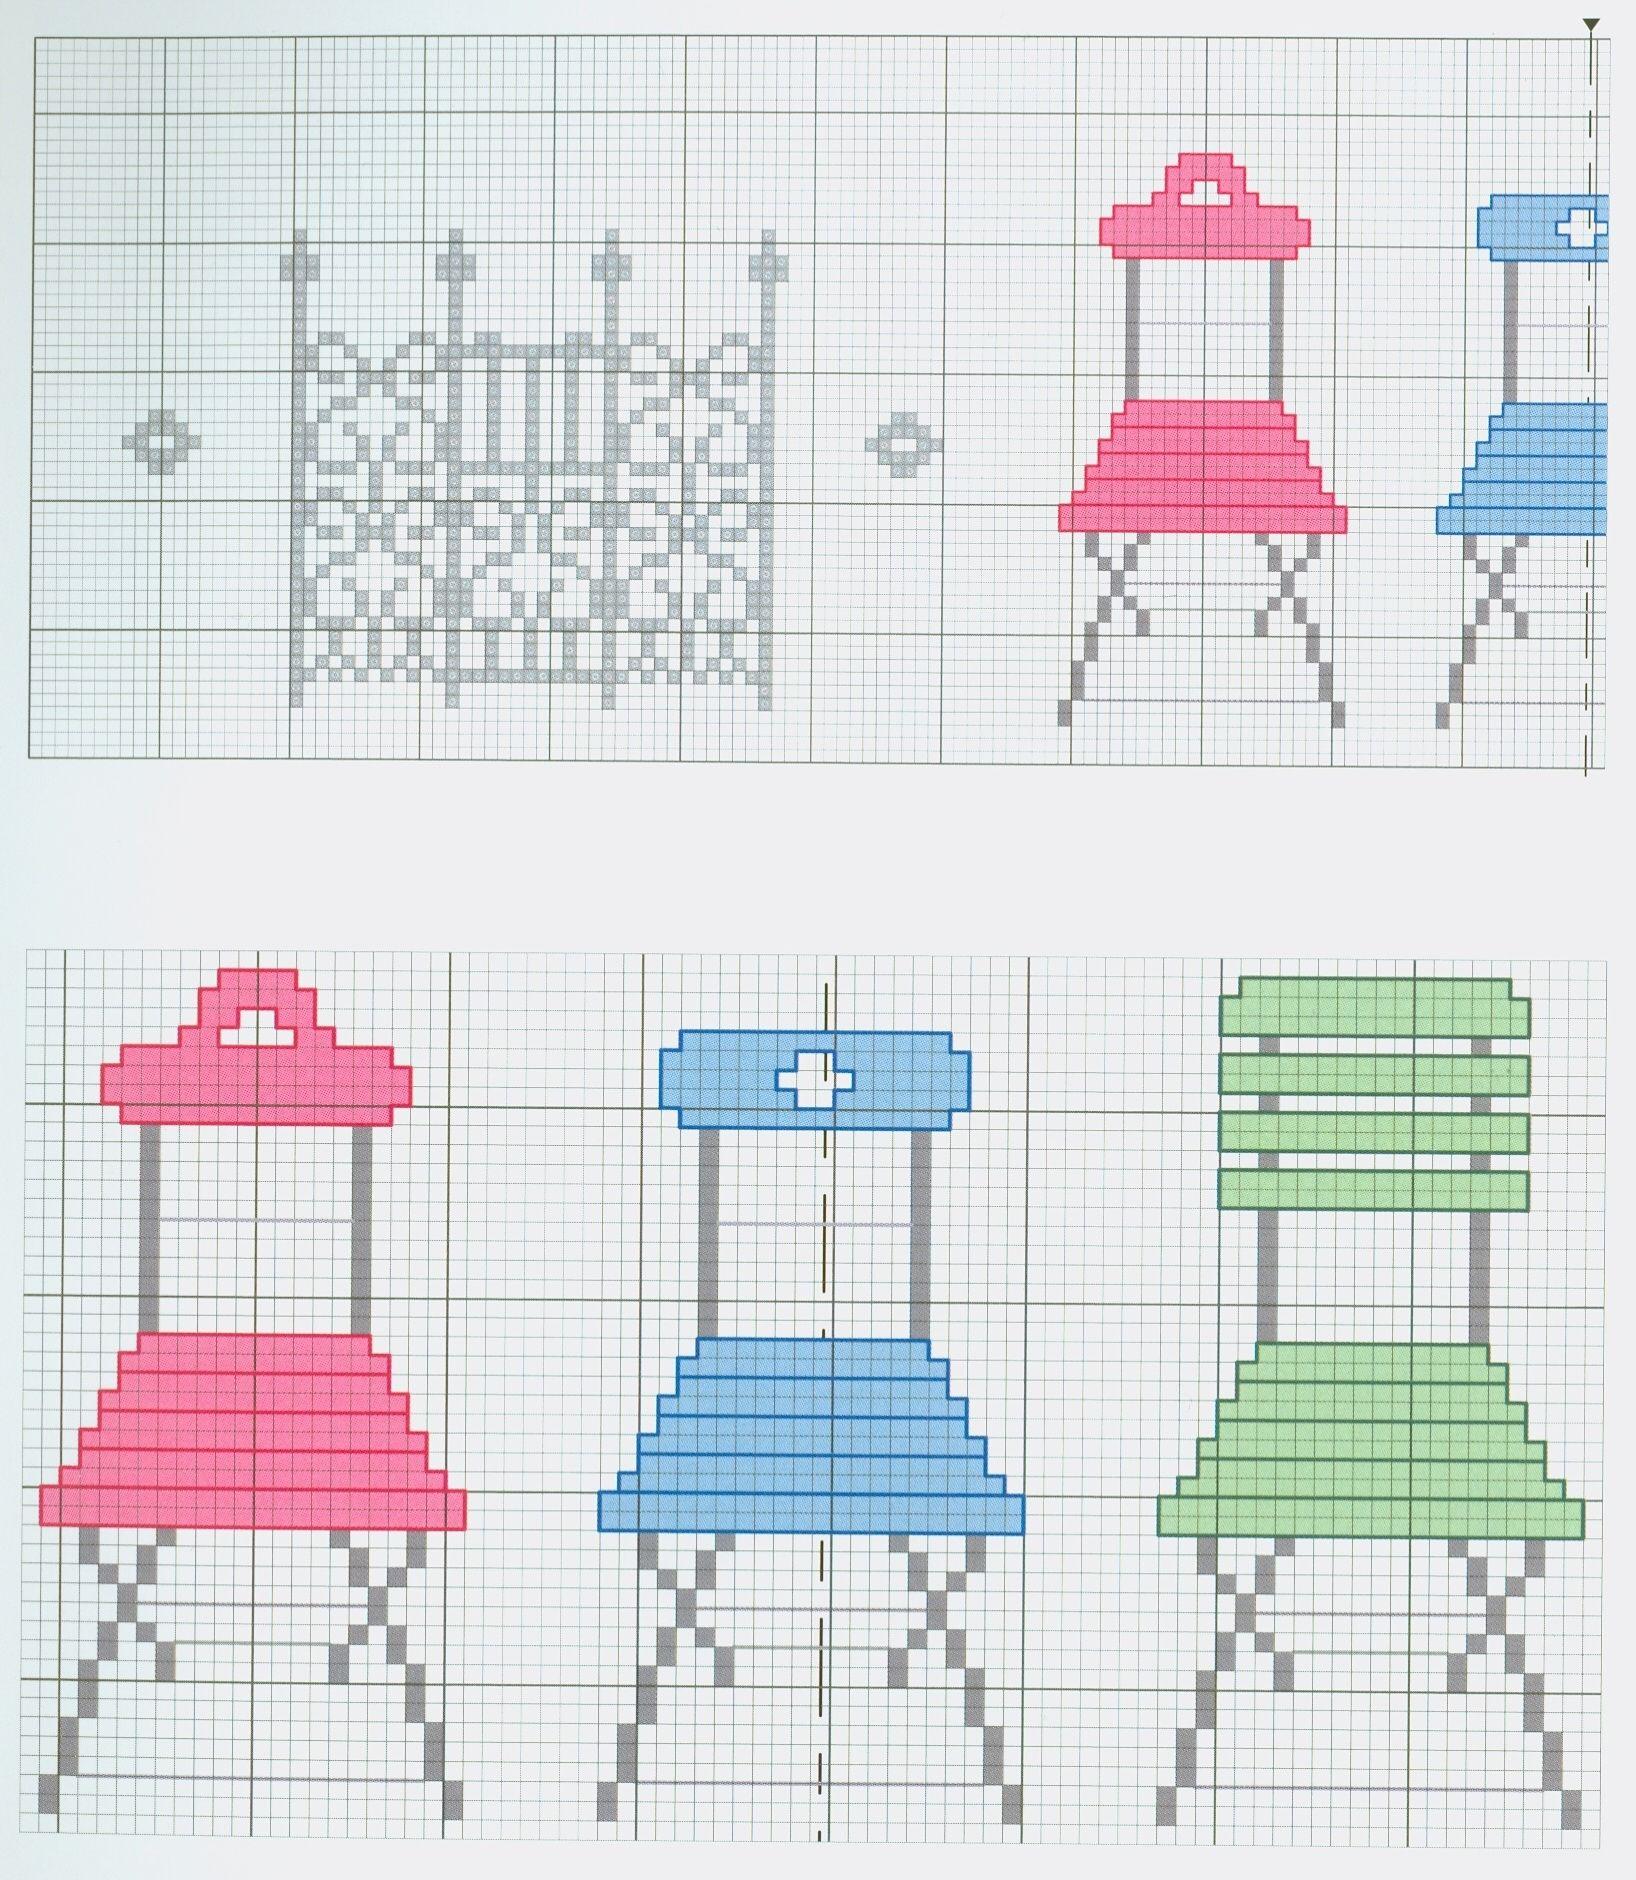 Cute chairs (part 1) free cross stitch pattern from www.coatscraft ...